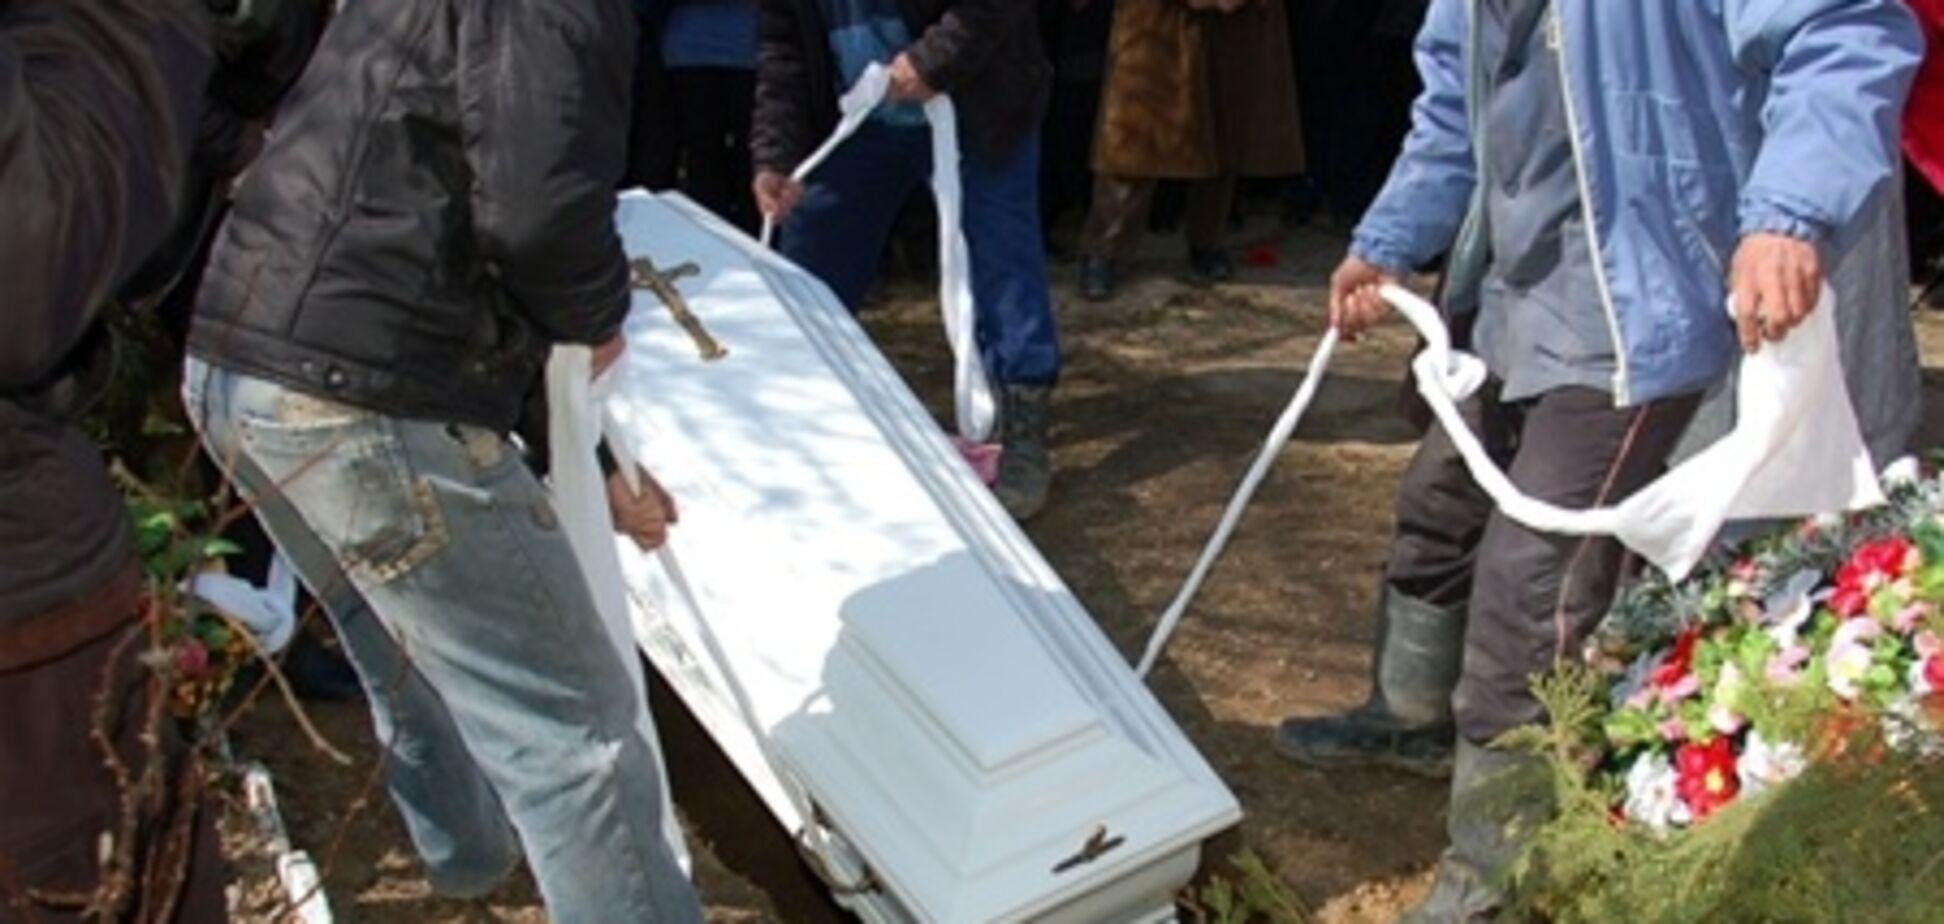 Оксану Макар хотели похоронить на поле среди мусора